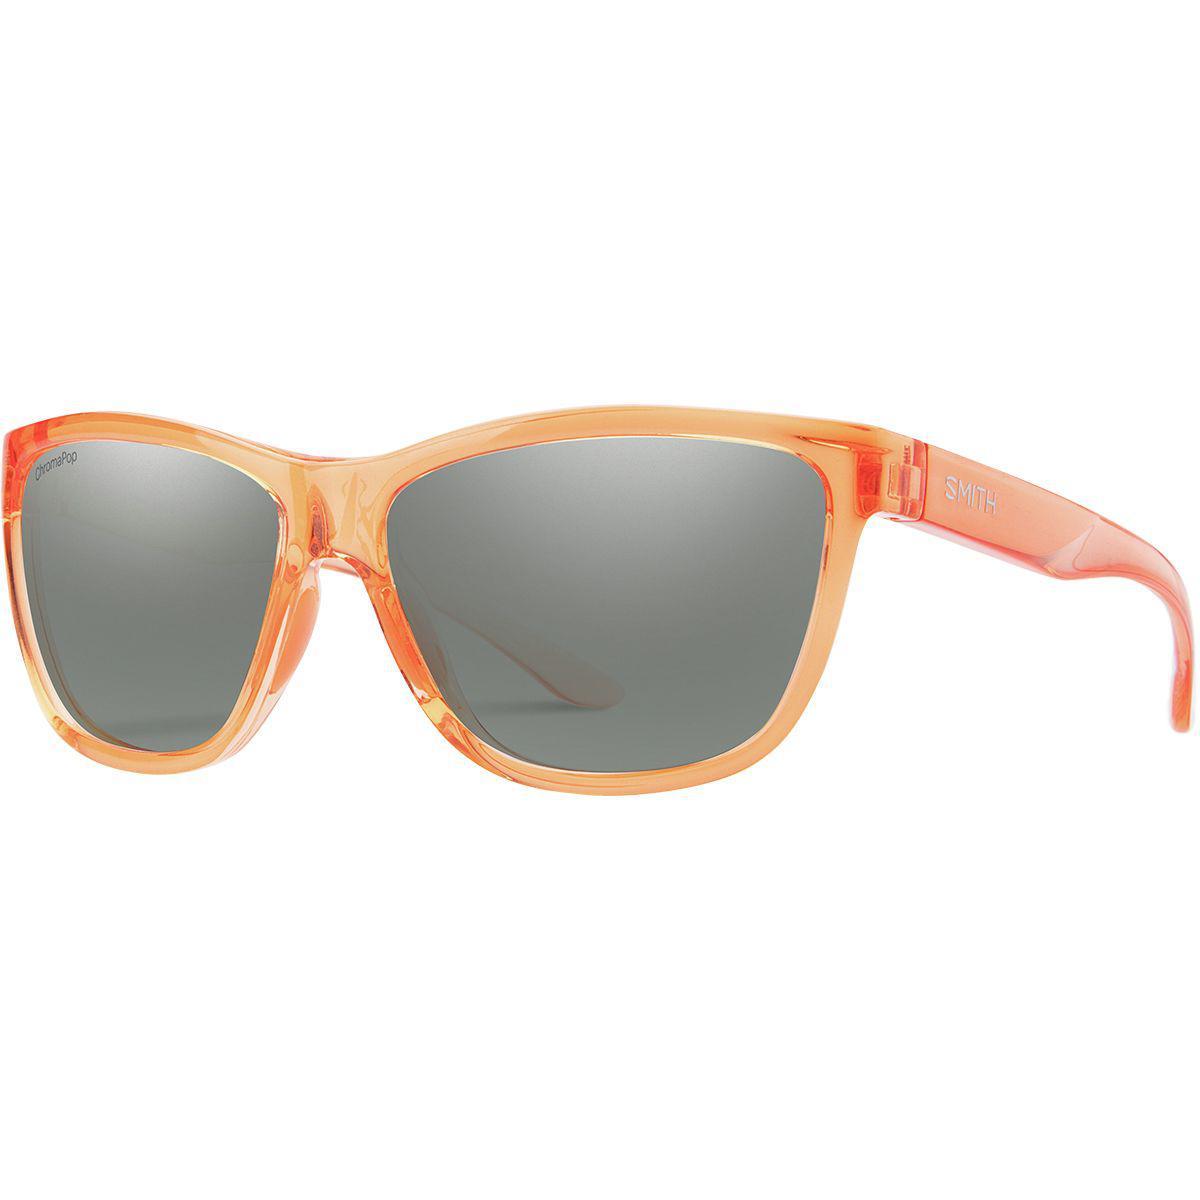 6a2387c80c Smith - Gray Eclipse Chromapop Polarized Sunglasses - Lyst. View fullscreen